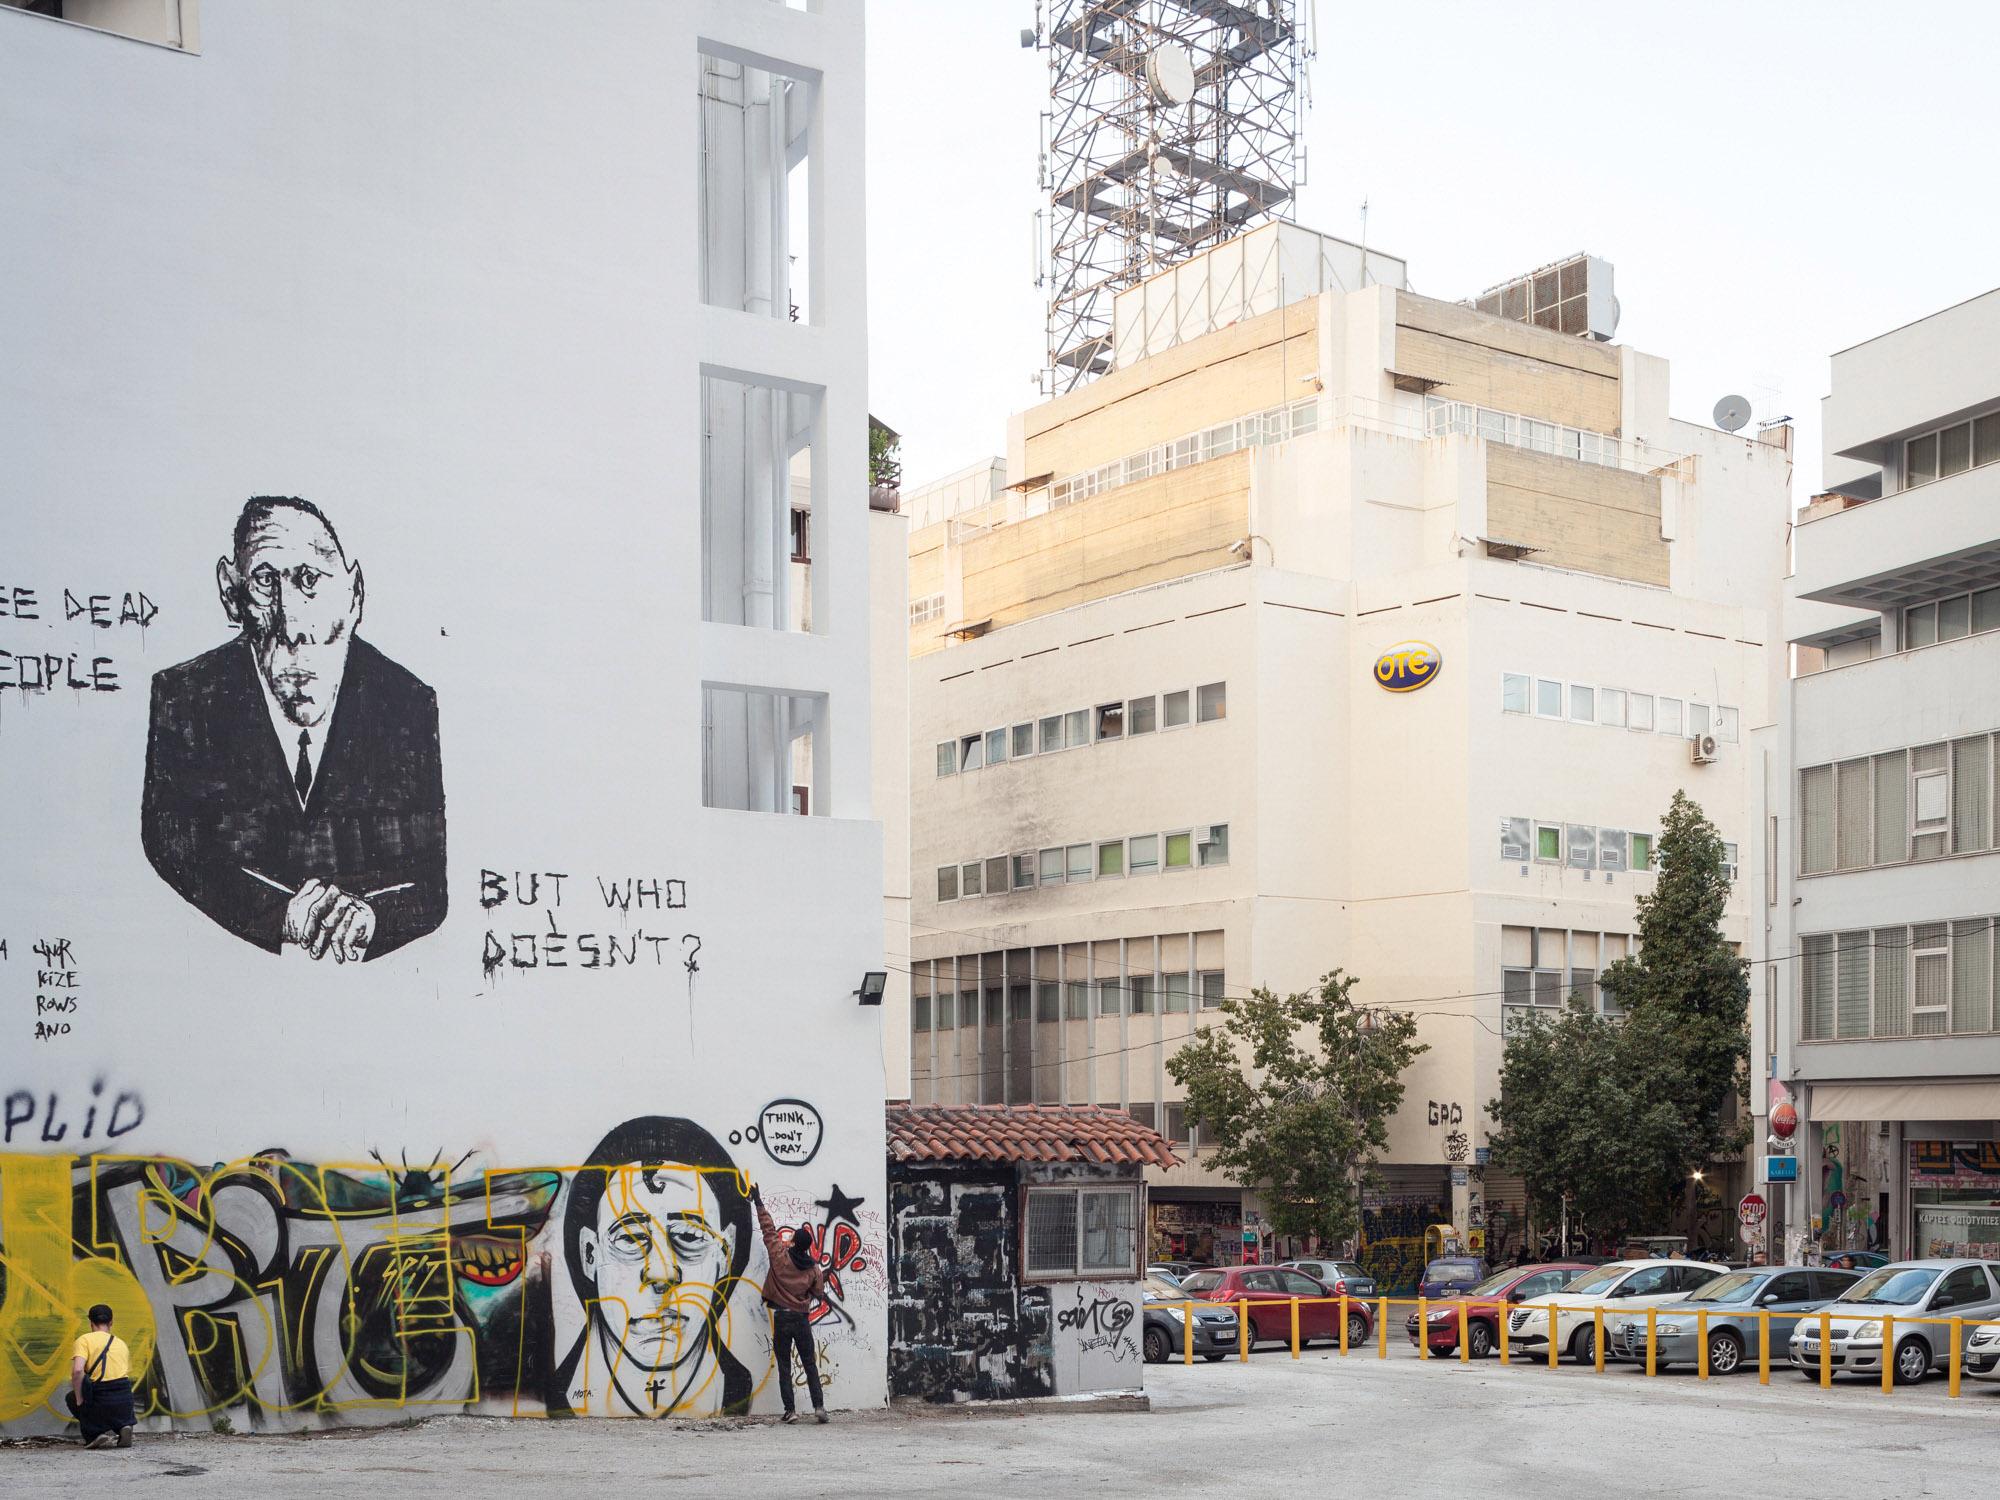 Athen-3936-2.jpg